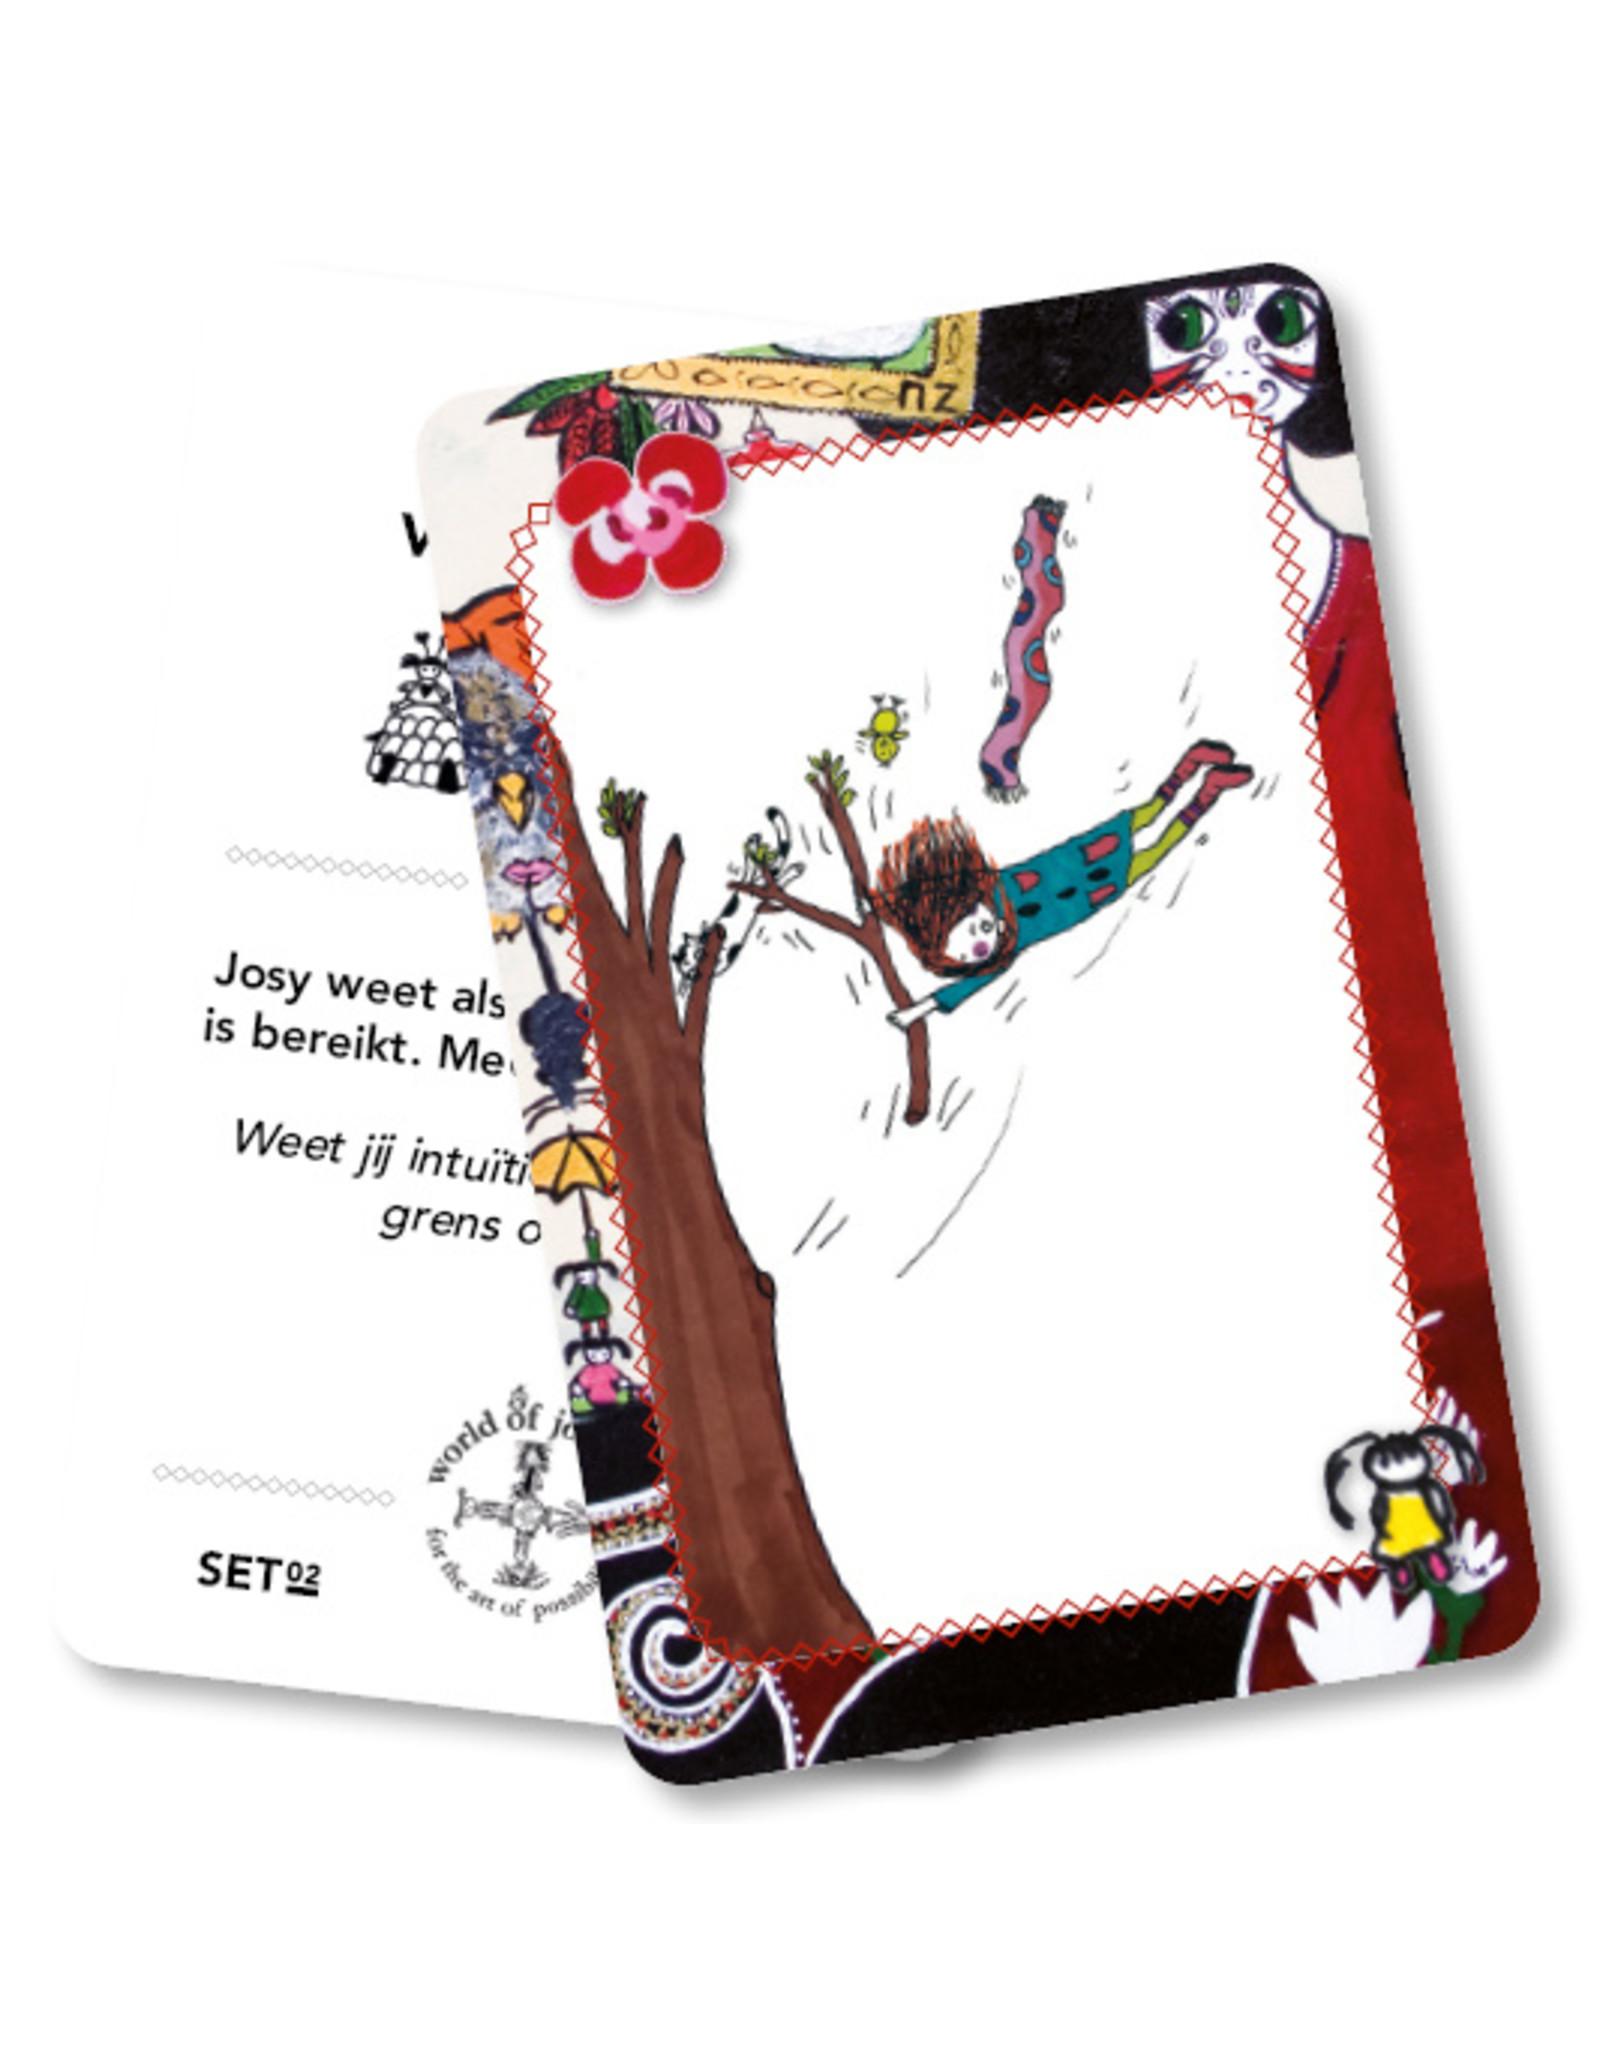 Josy kaarten leven in balans